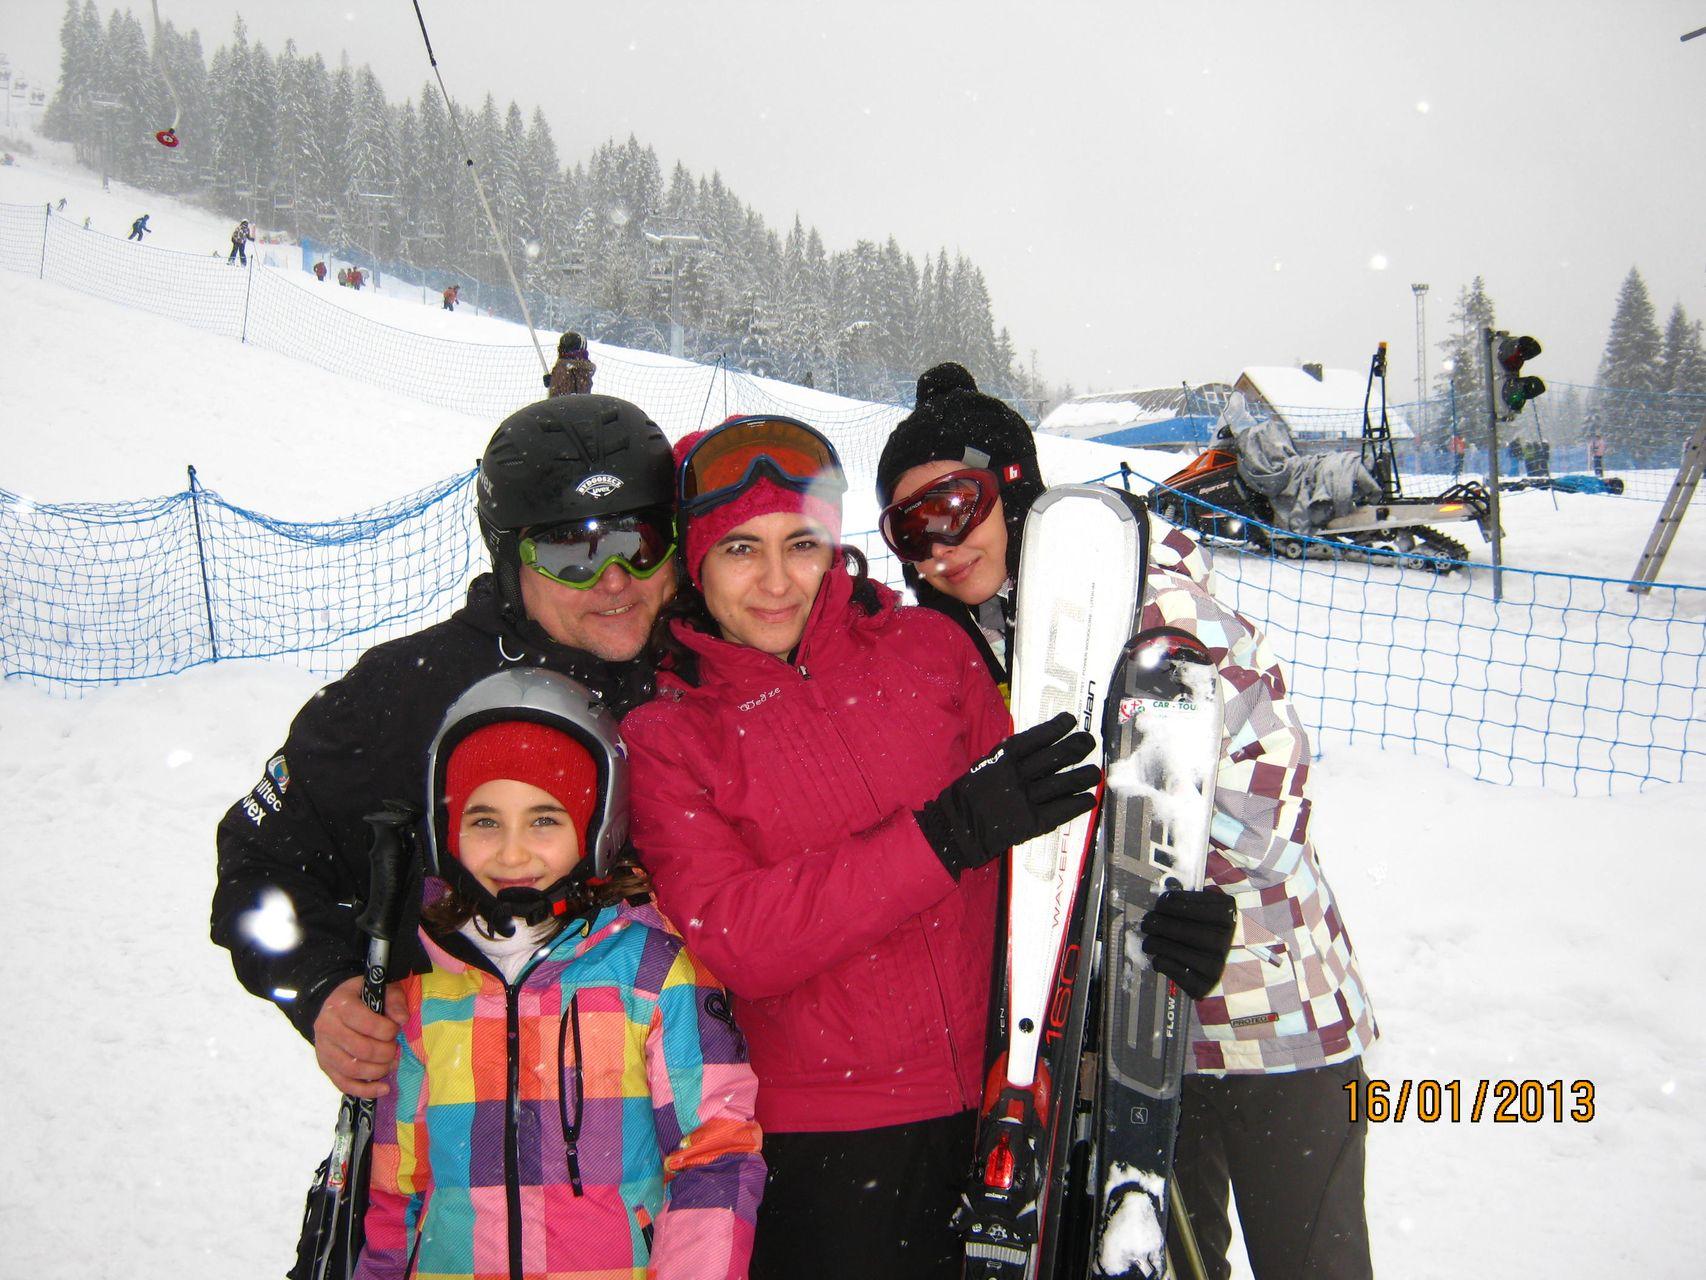 CarTourist_narty-snowboard_2013-foto-17